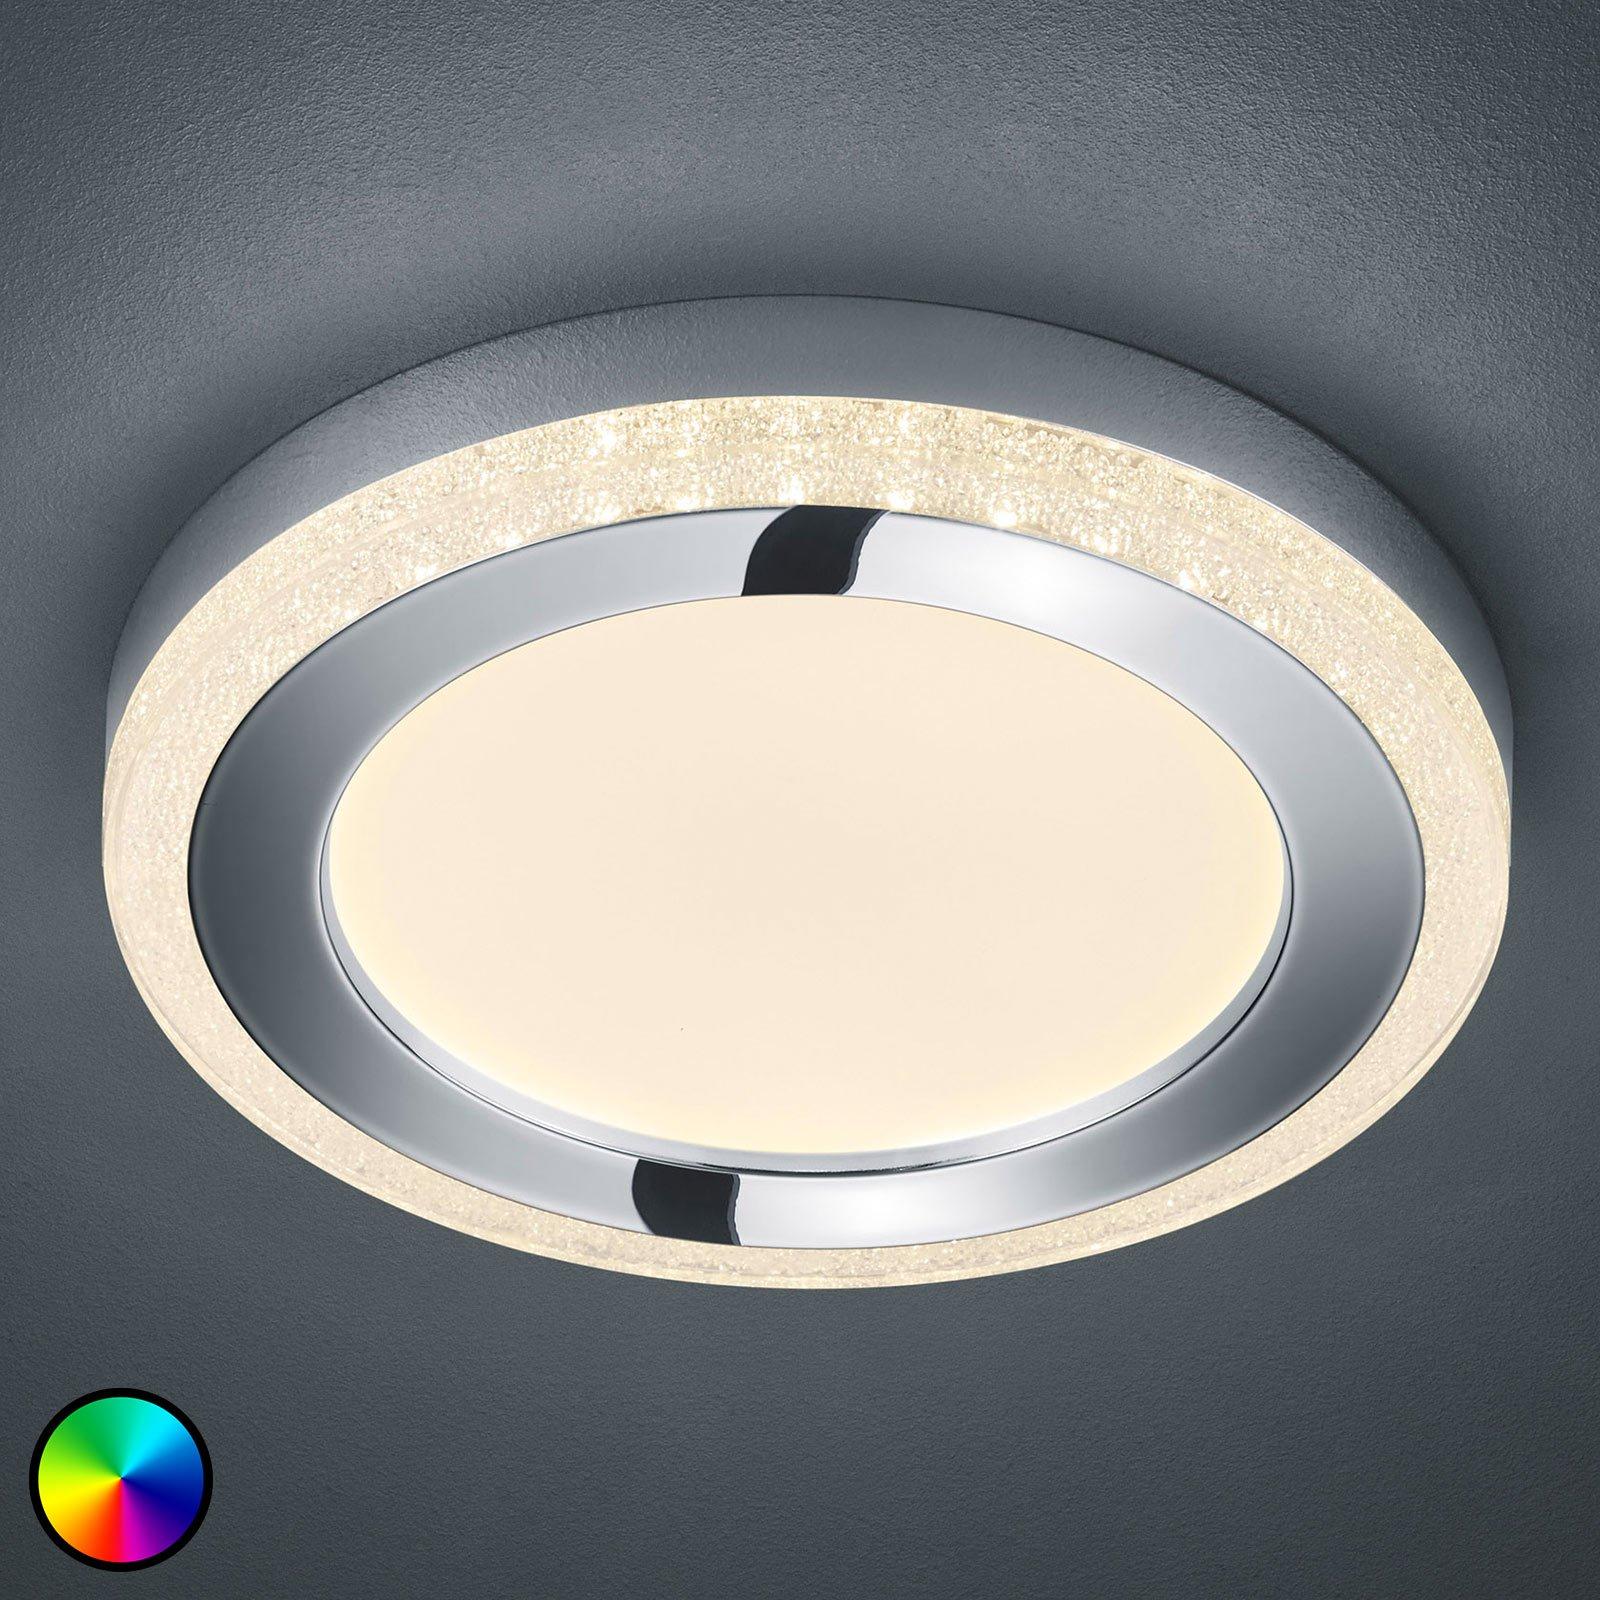 LED-taklampe Slide, hvit, rund, Ø 40 cm